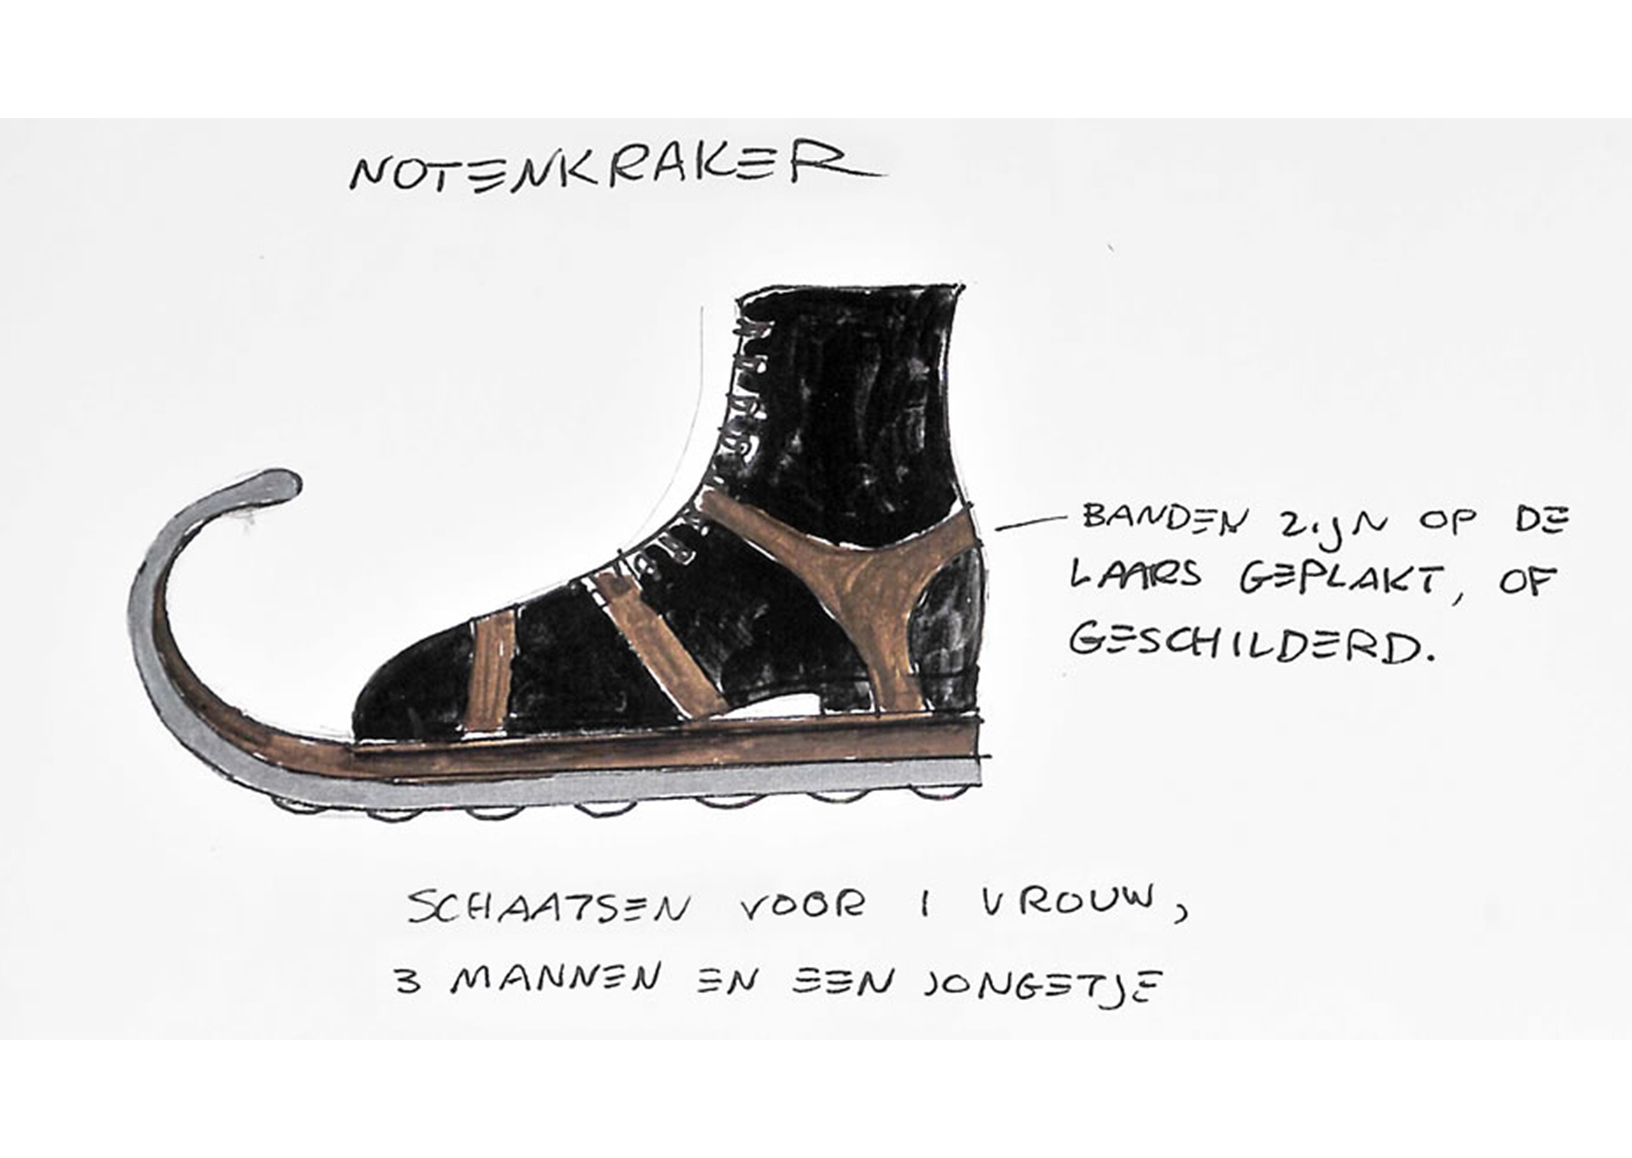 Notenkraker schaats